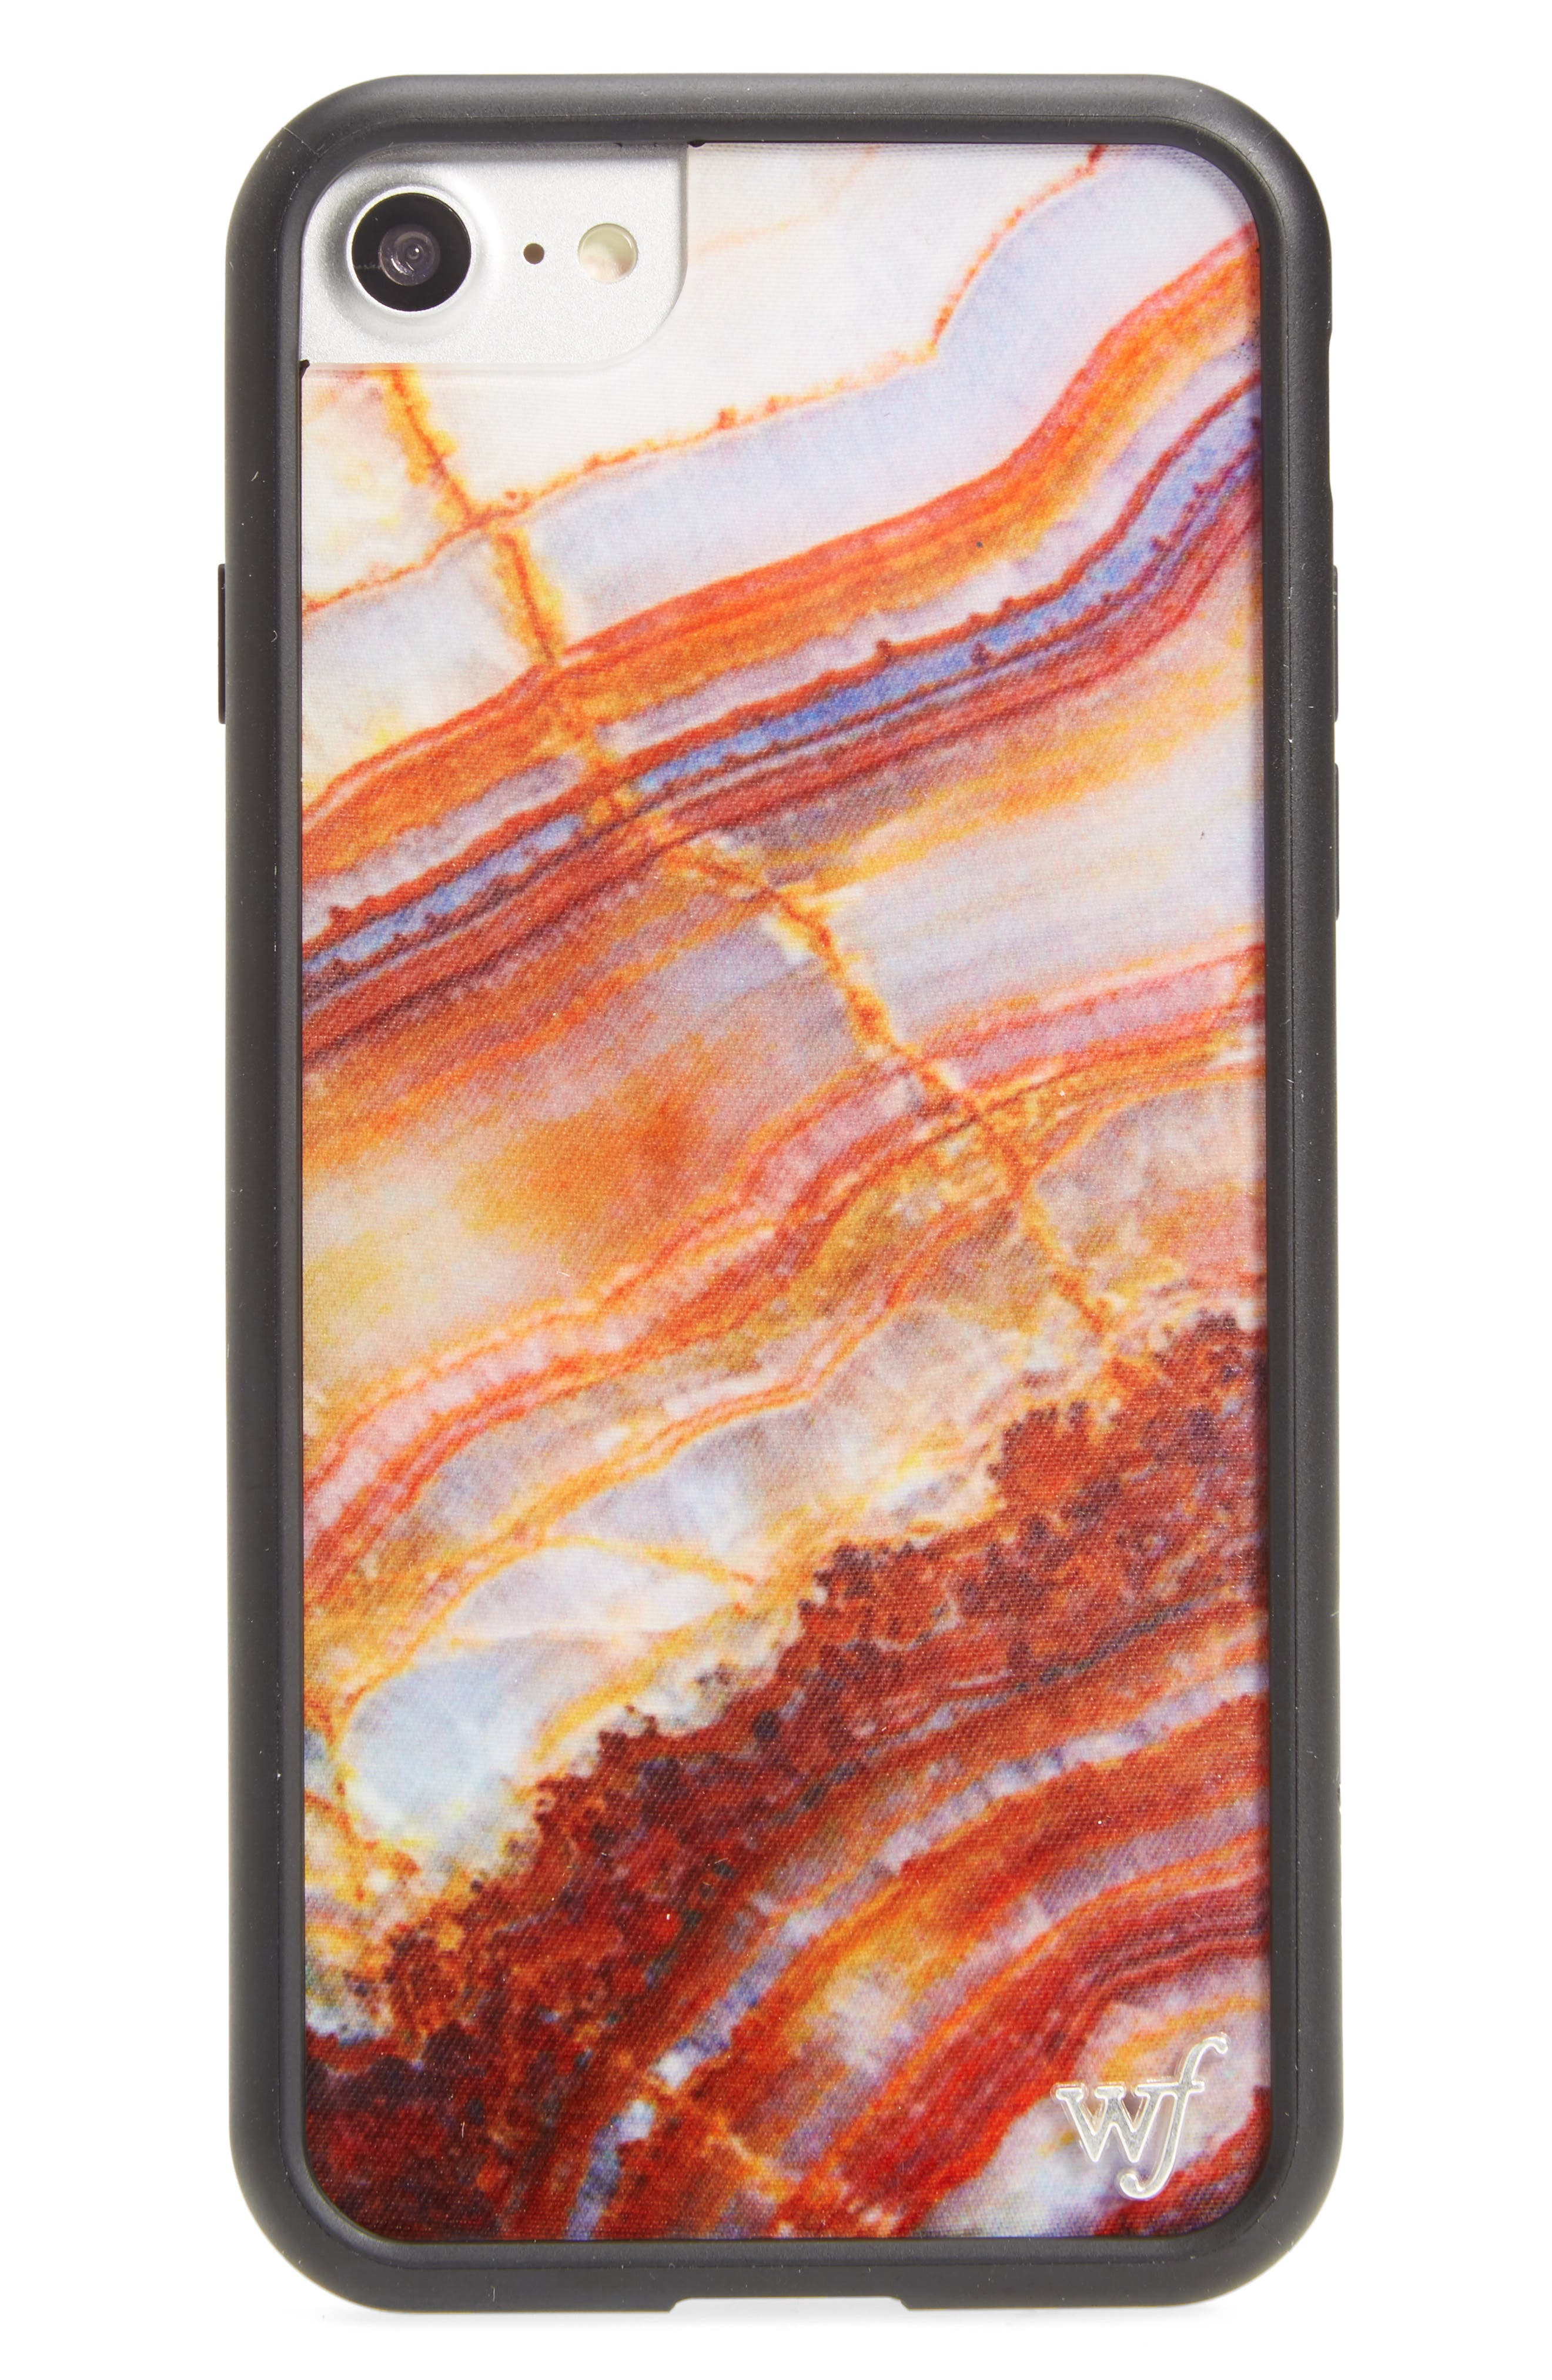 Wildflower Mystic Stone iPhone 6/6s/7 Case